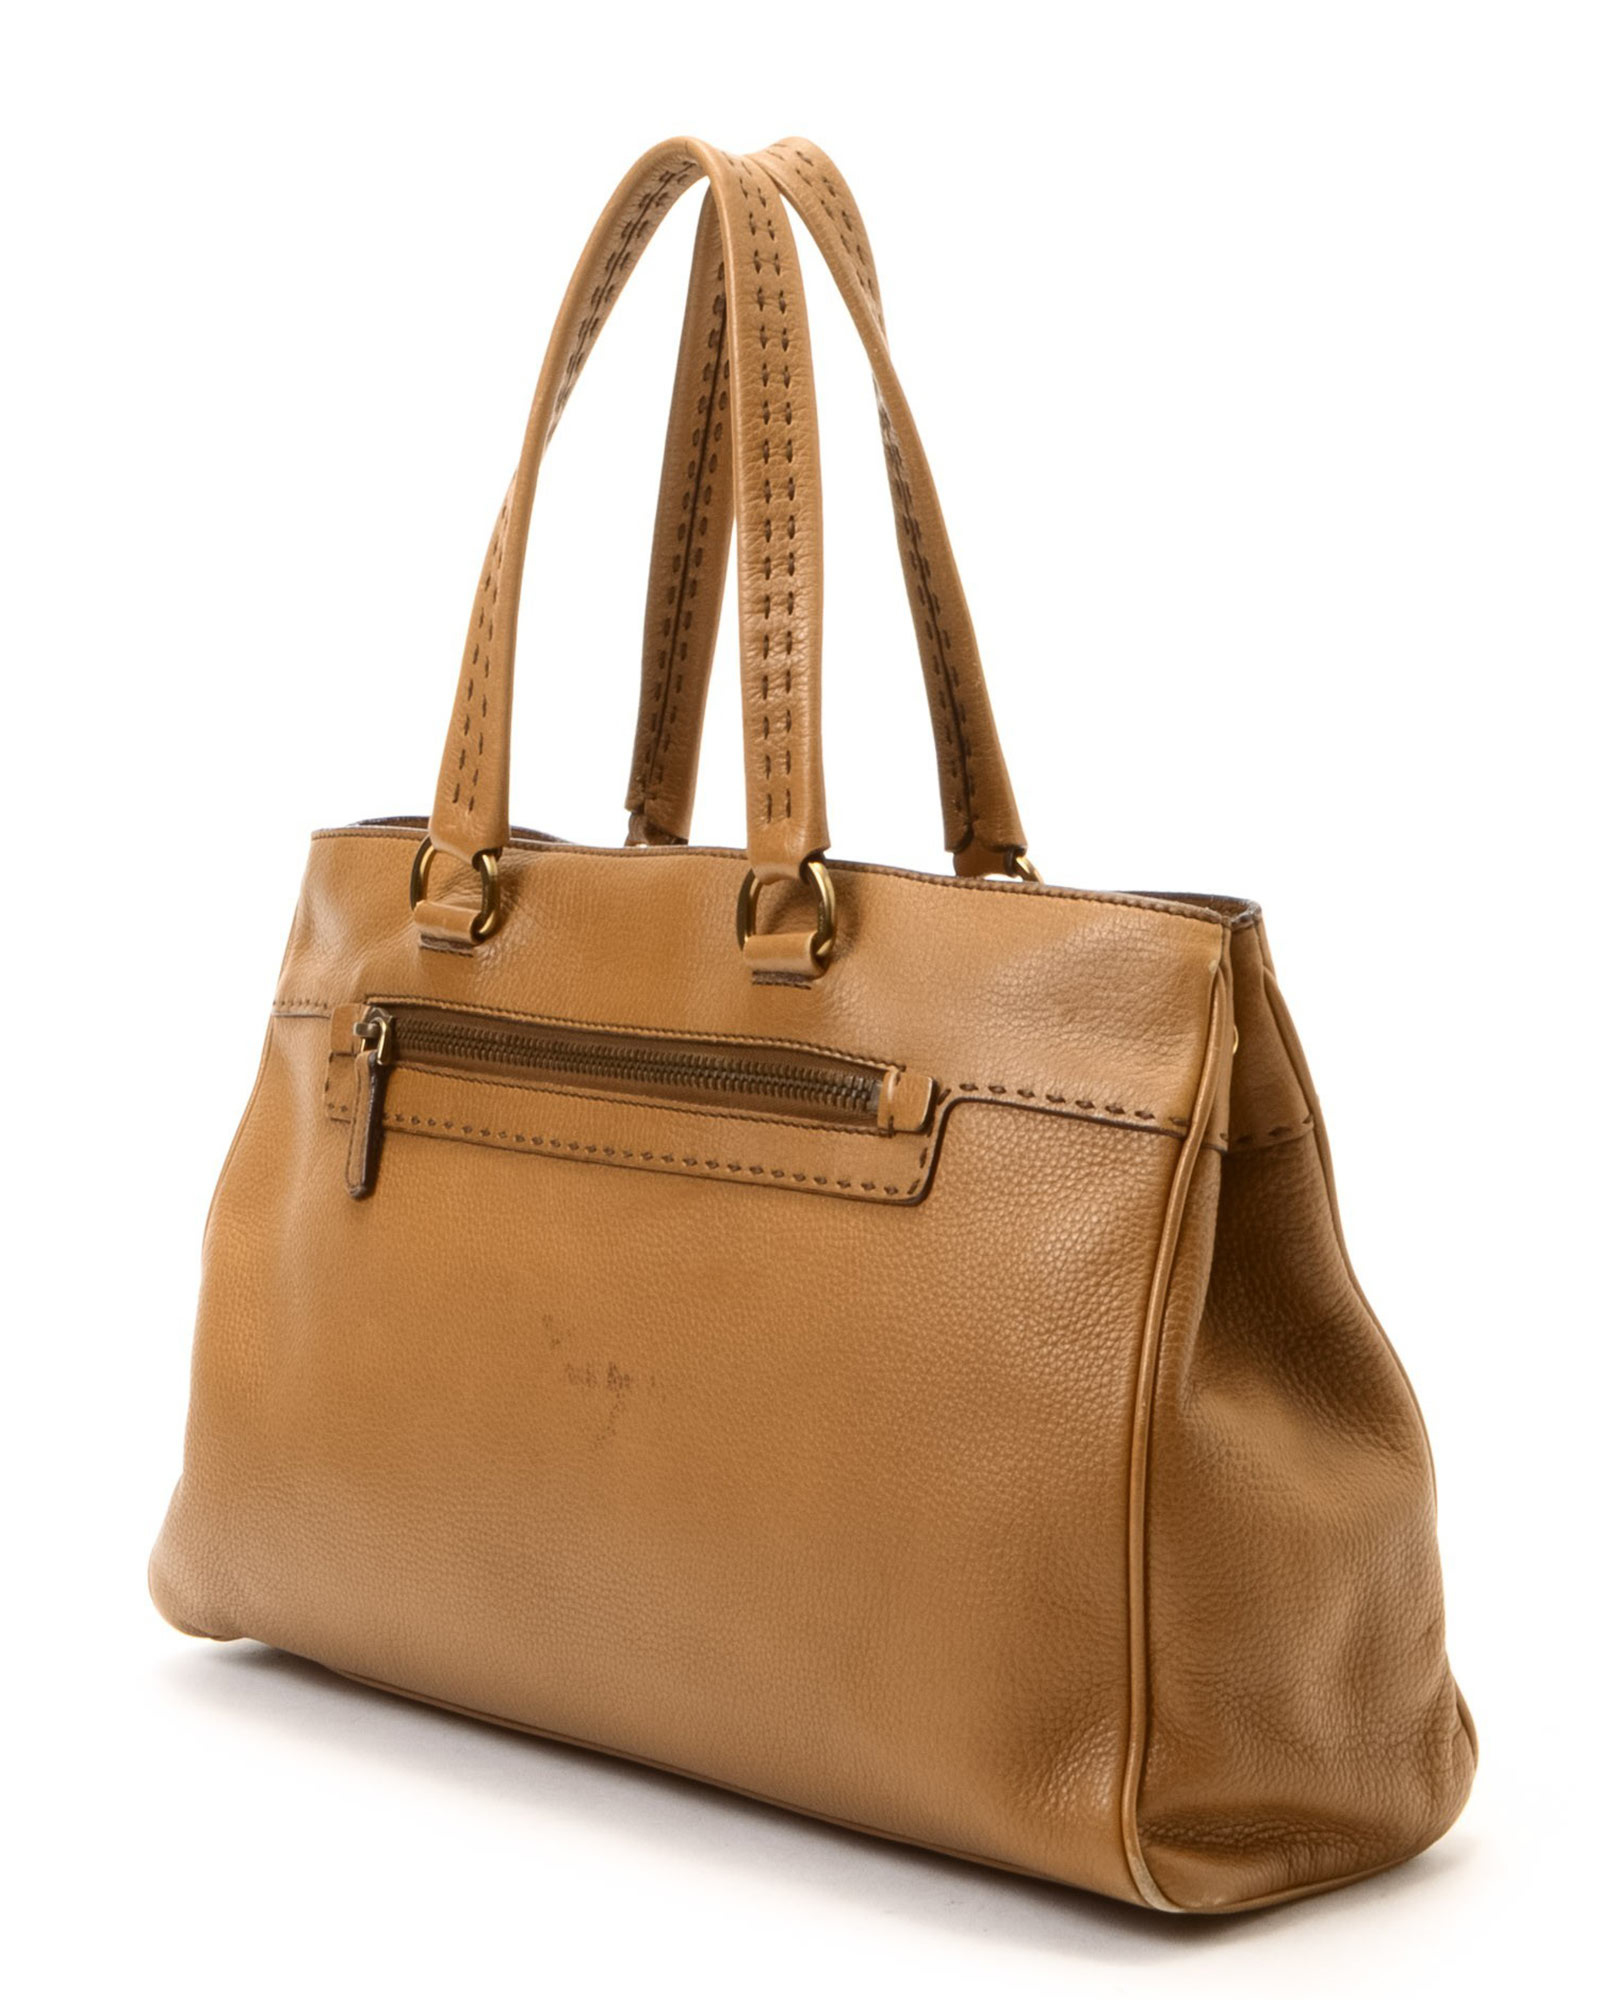 prada briefcase for women - Prada Tote - Vintage in Beige | Lyst